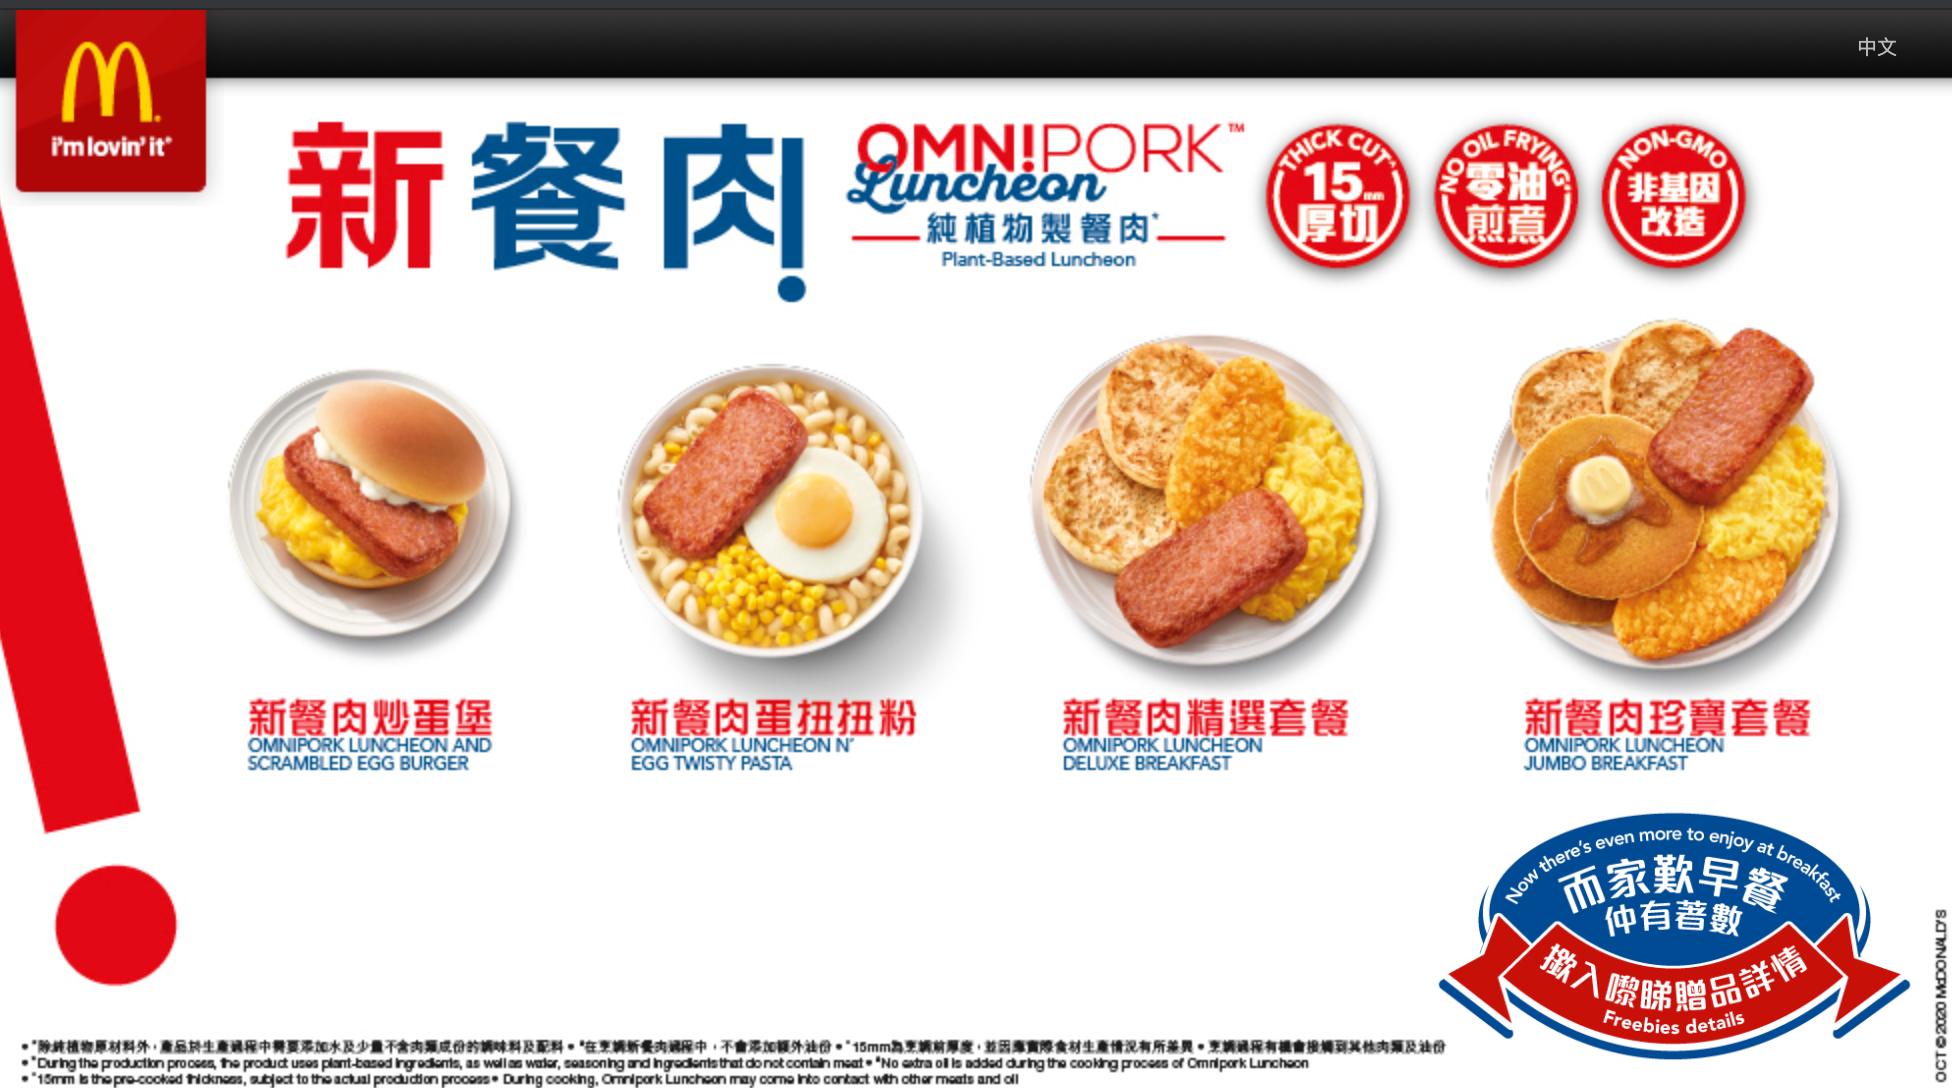 Source: McDonald's Hong Kong